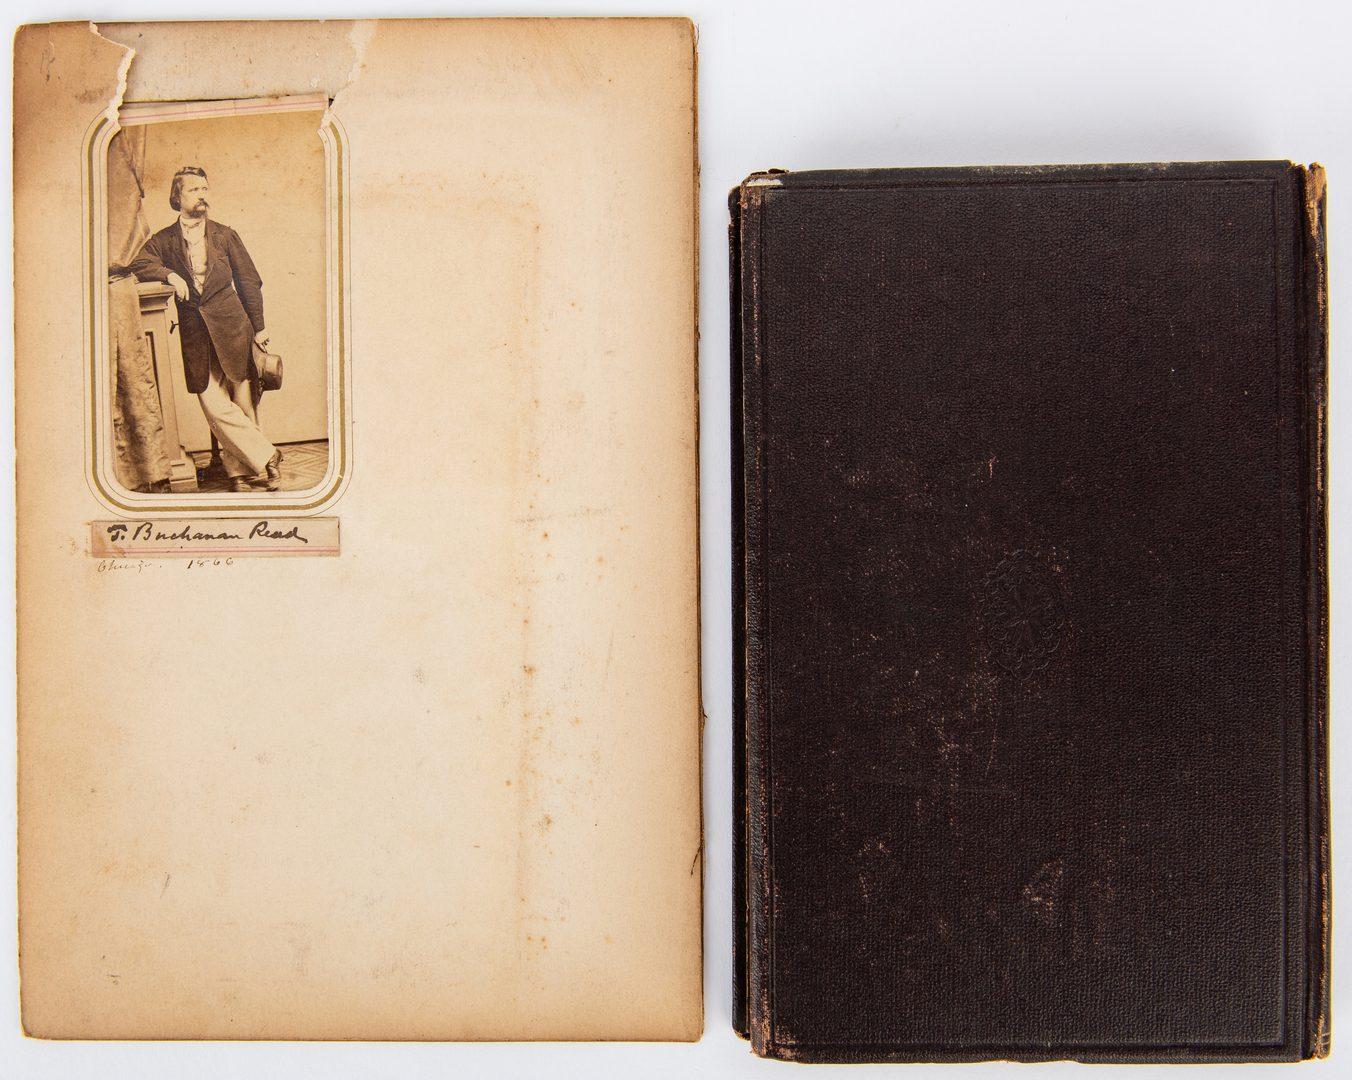 Lot 379: Thomas Buchanan Read autograph, CDVs and book:  A Summer Story, 1865